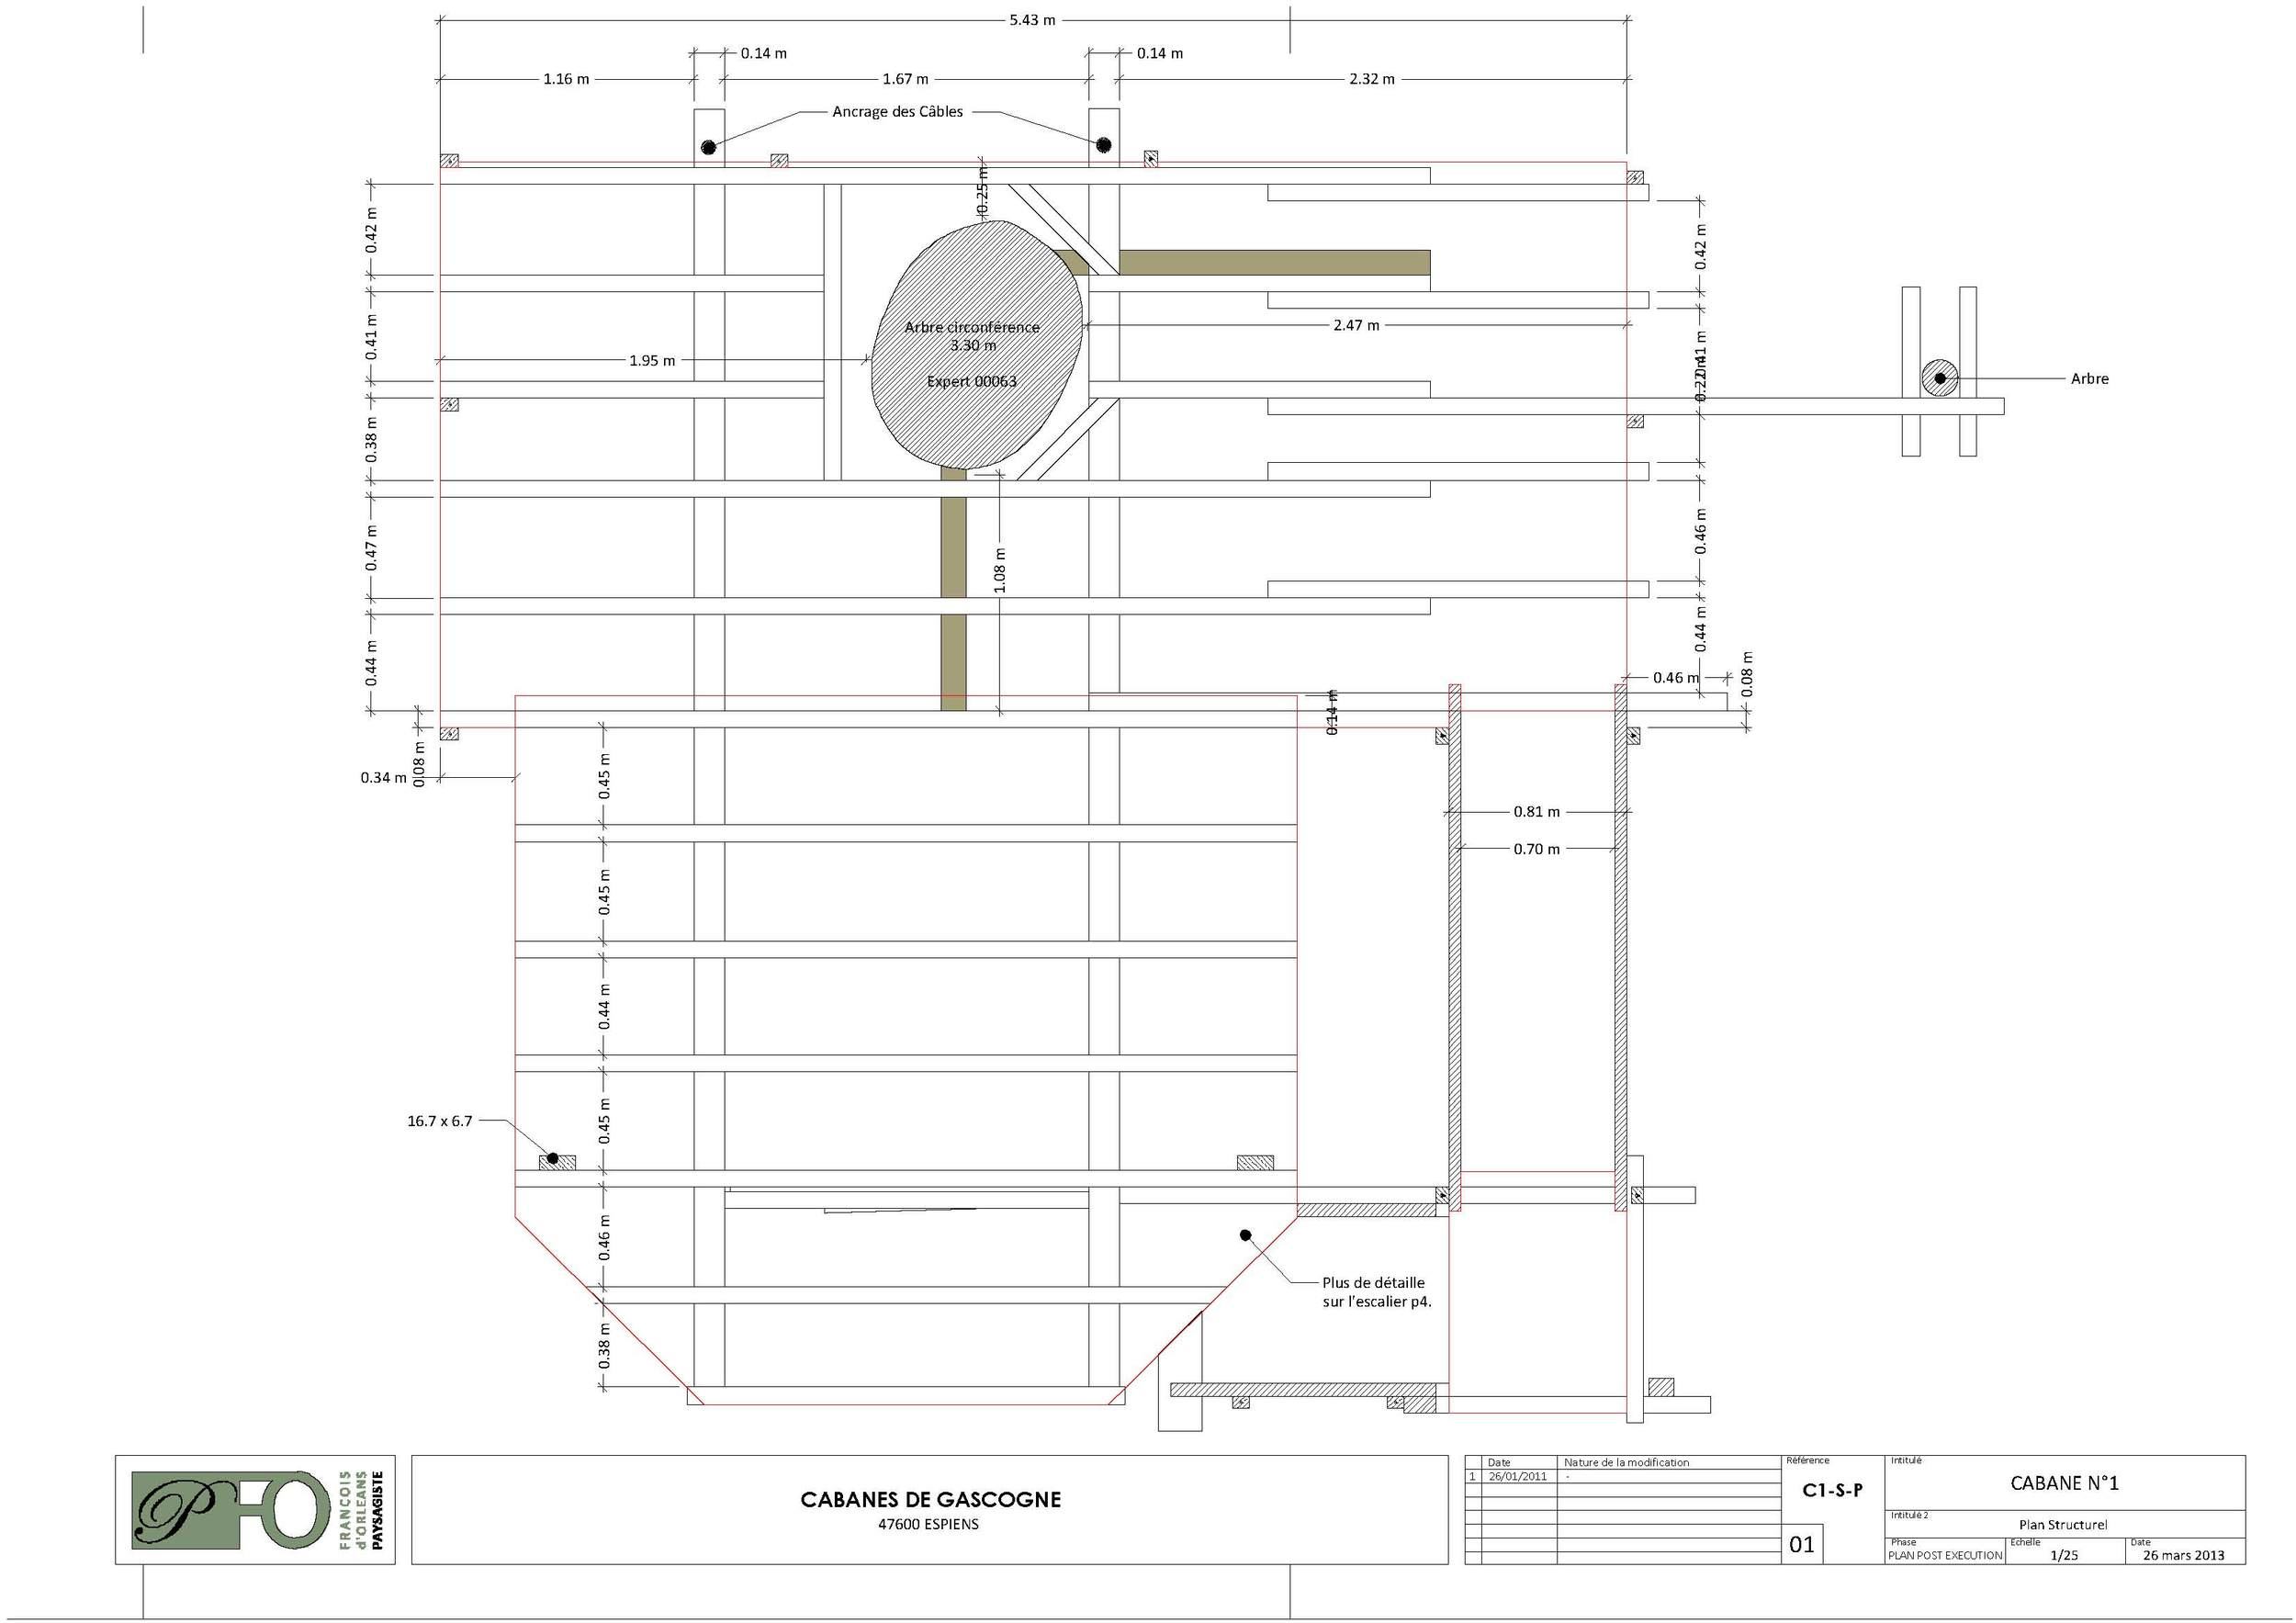 ARCONQUE - MERODE 2013.04.09-C1-S-P.jpg